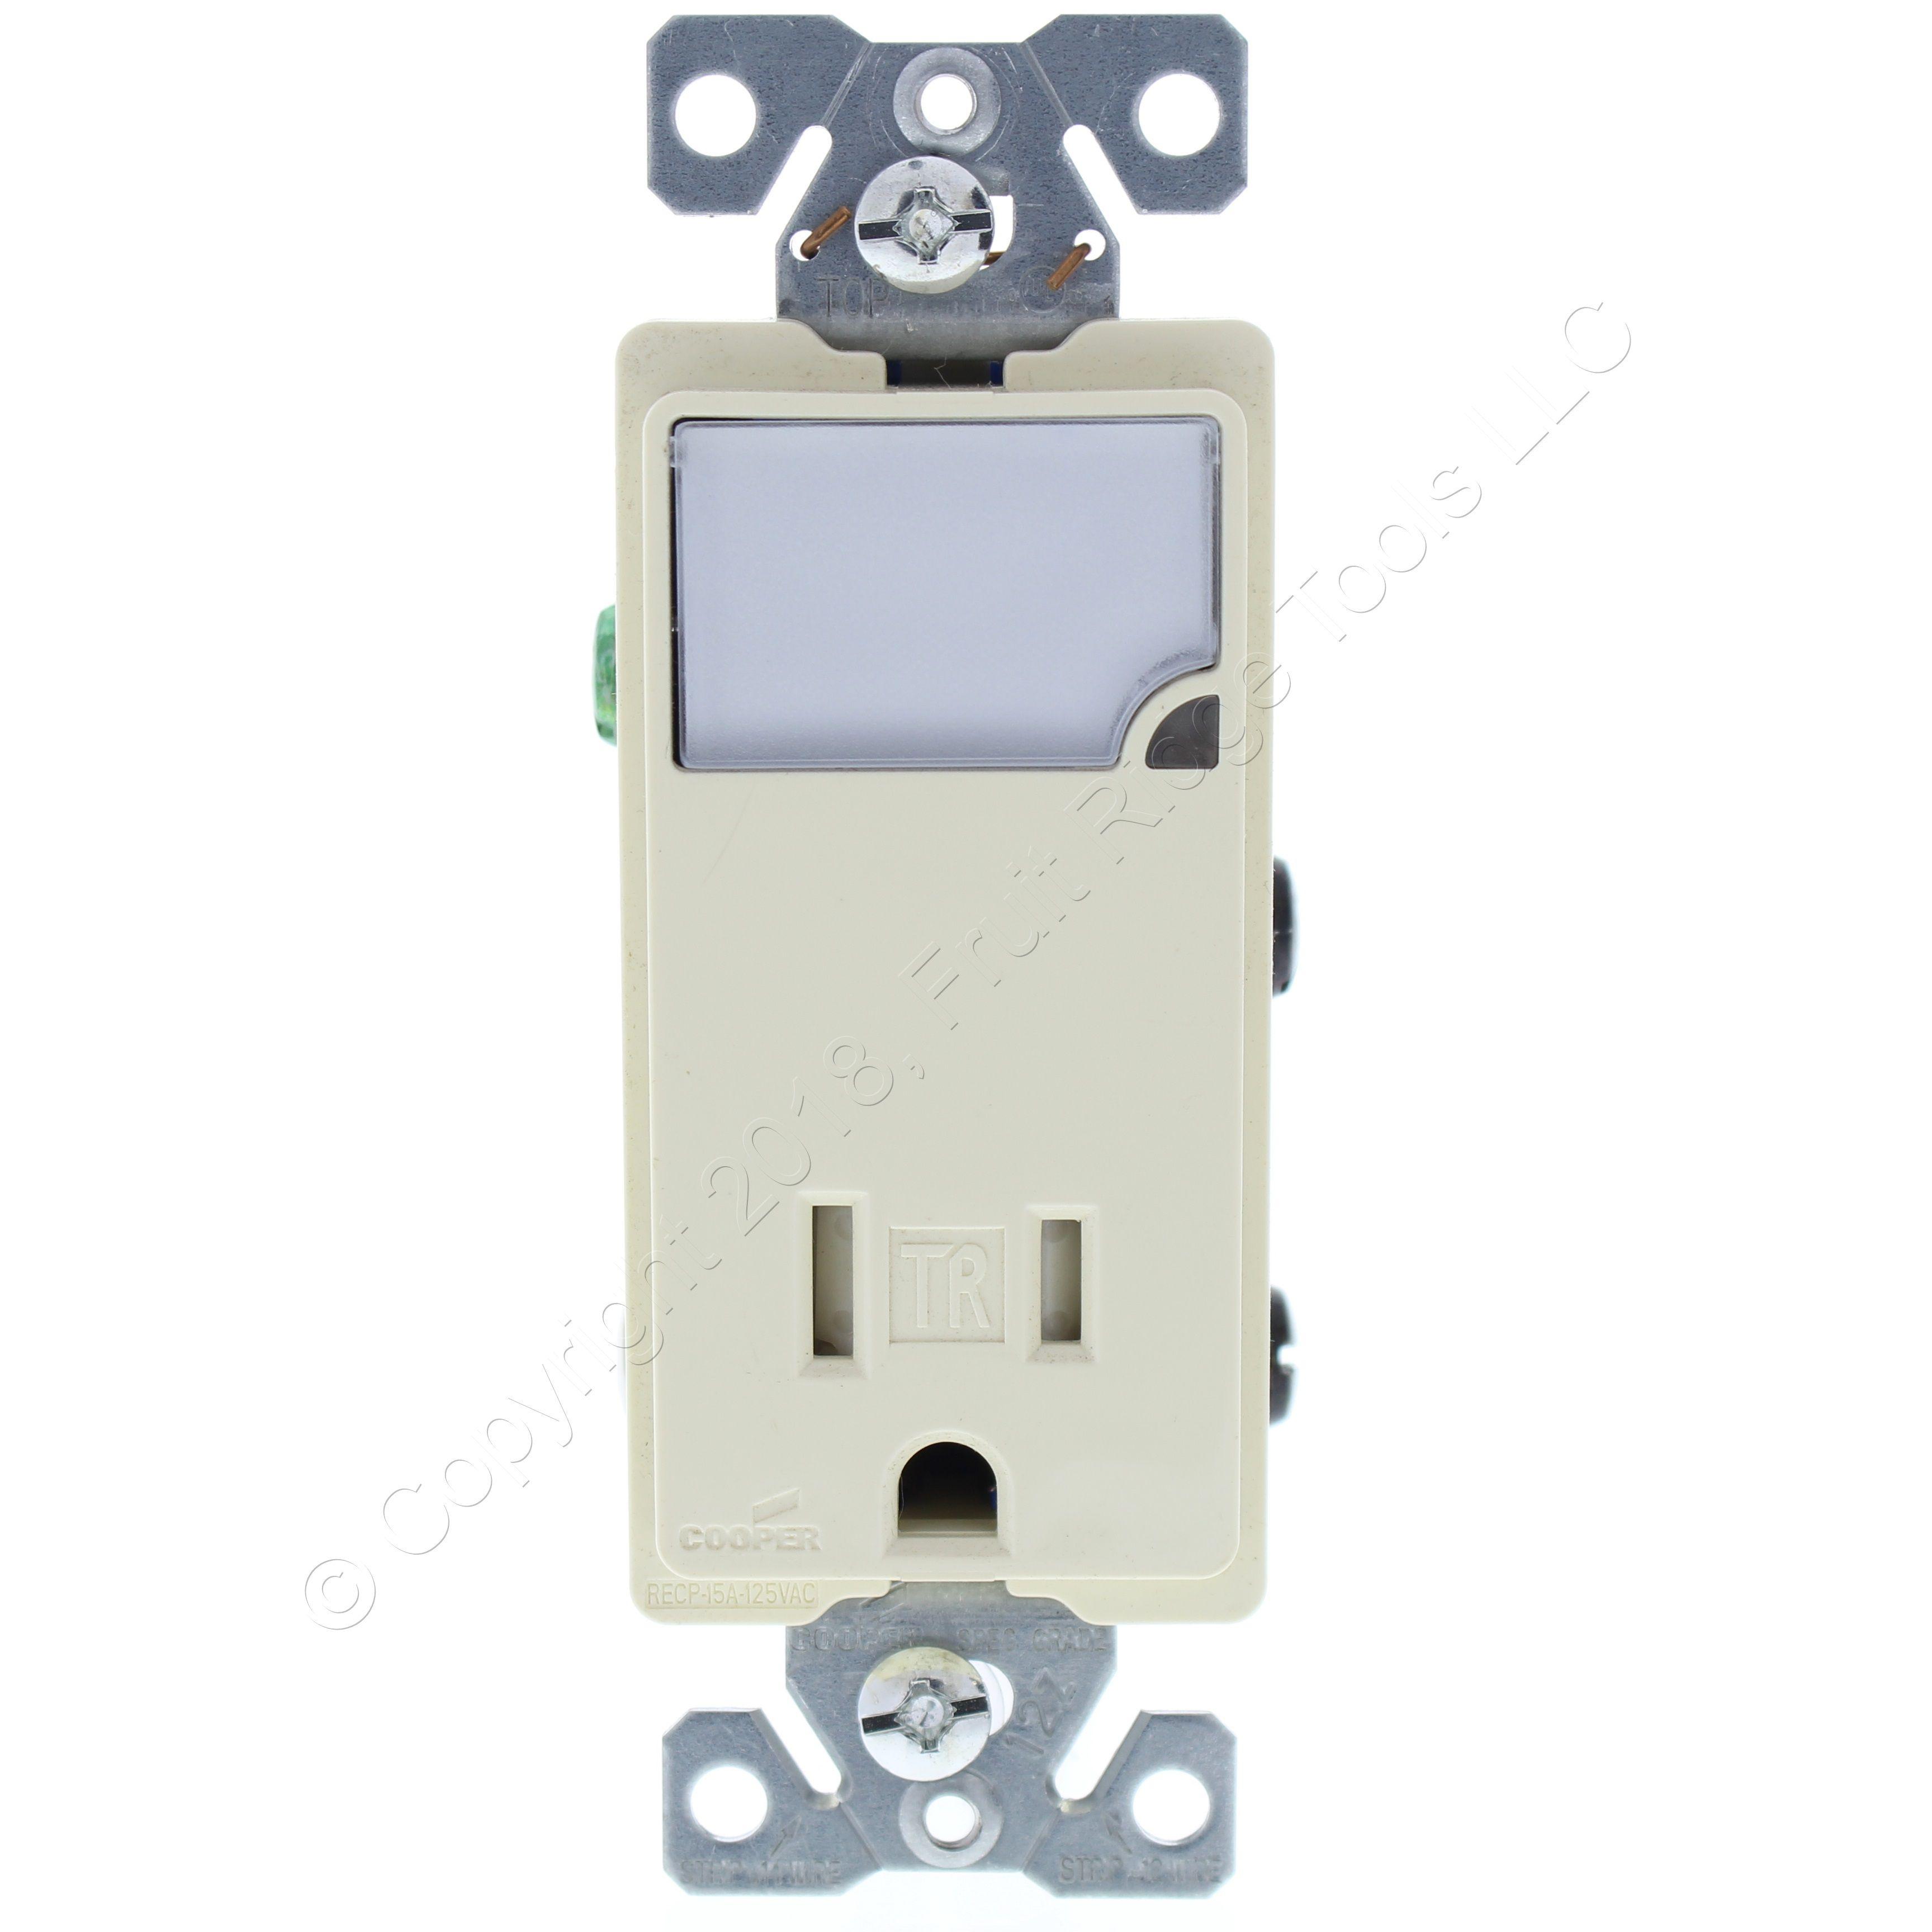 125-Volt NEMA 5-15 Light Almond EATON Wiring TR270LA Tamper Resistant Duplex Receptacle with 15-Amp